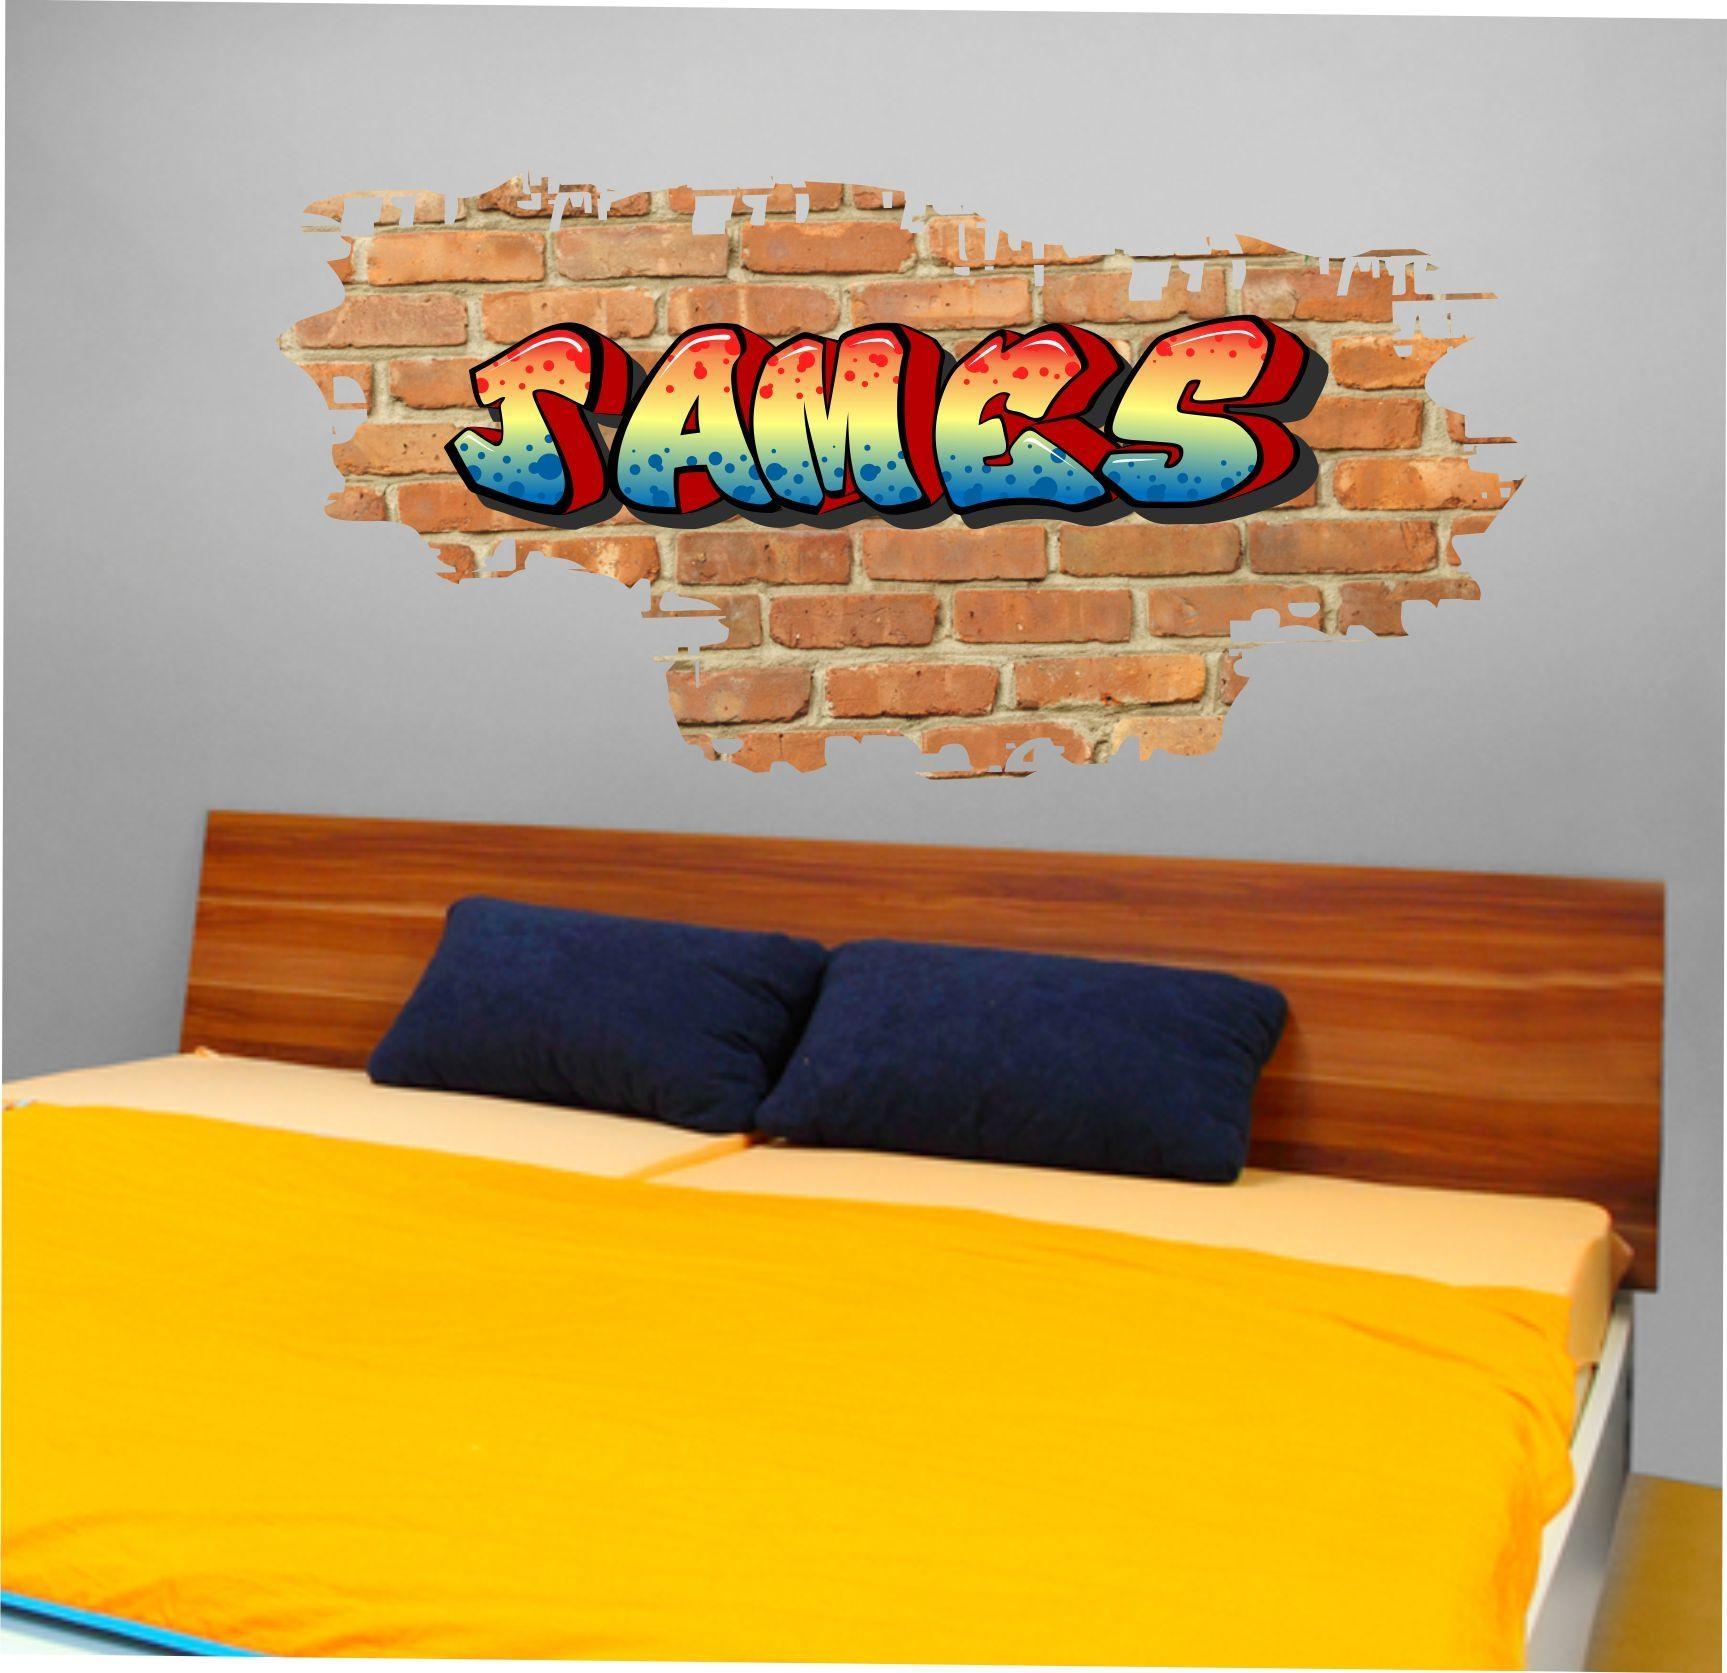 The Grafix Studio   01 Personalised Graffiti Brick & Name Wall Sticker For Personalized Graffiti Wall Art (Image 15 of 20)